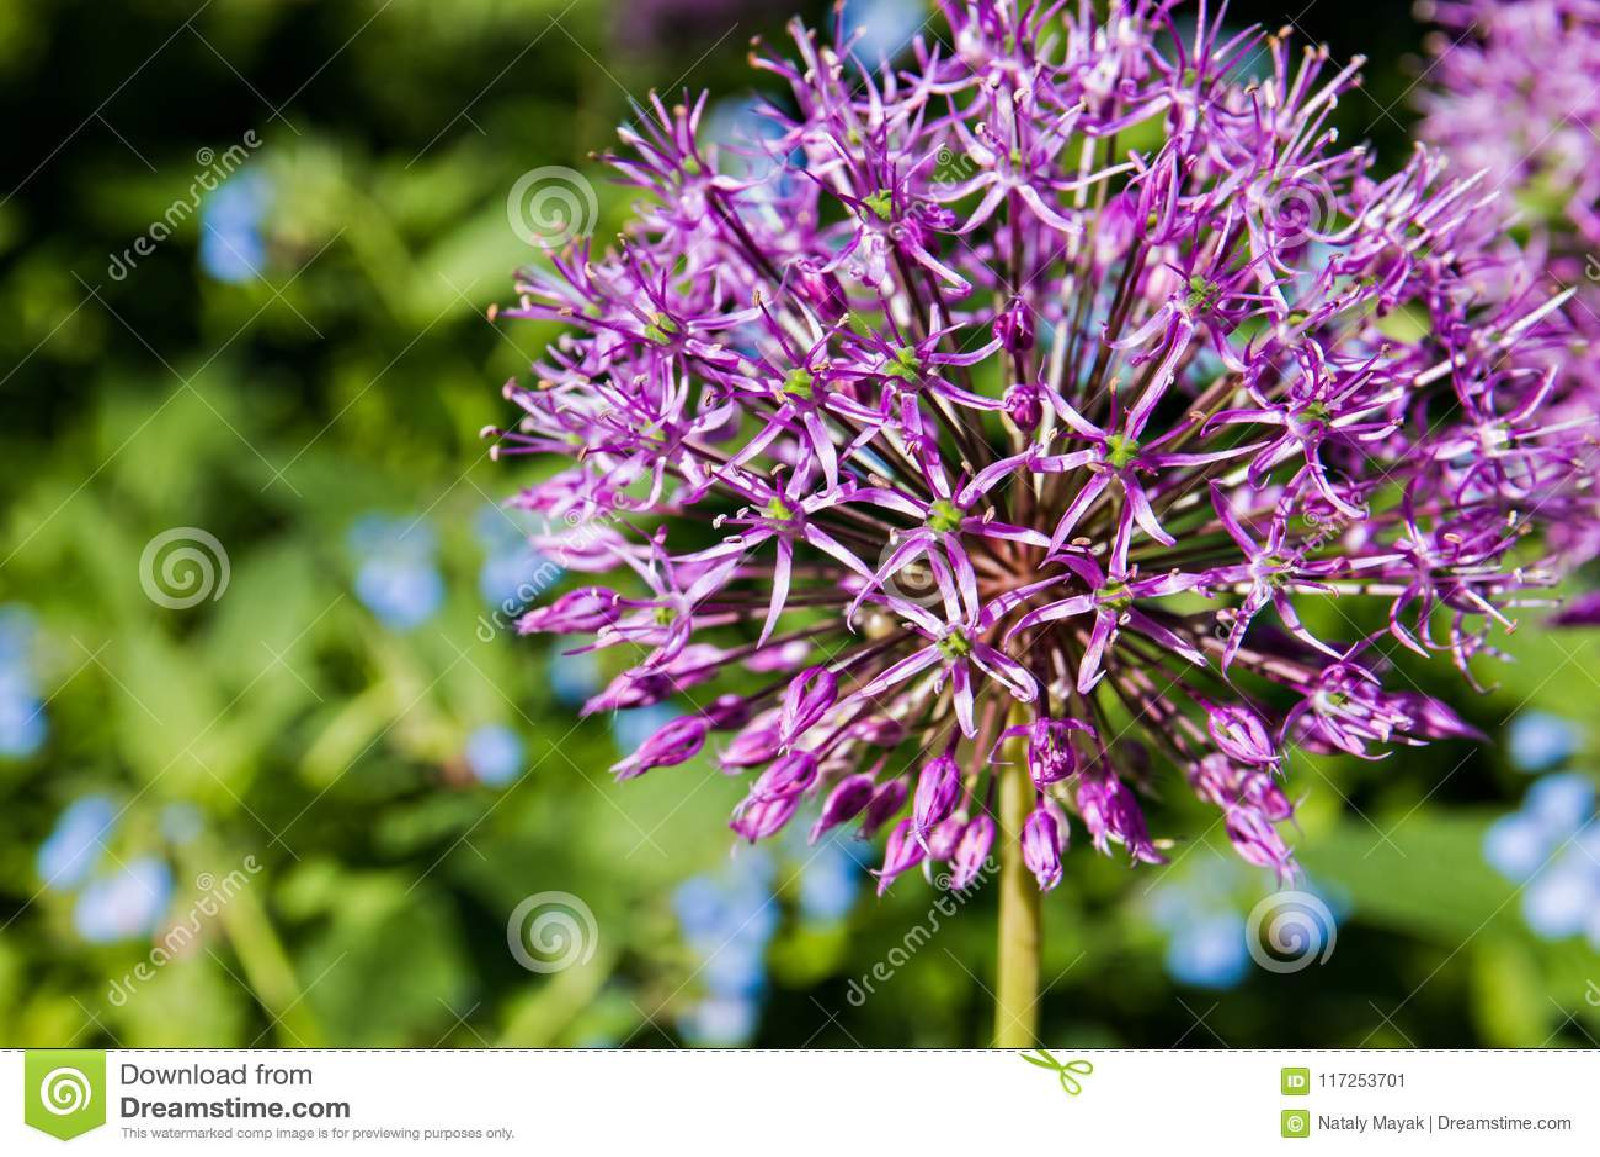 Nahaufnahme-teilweises Foto der purpurroten Lauch-Blüte